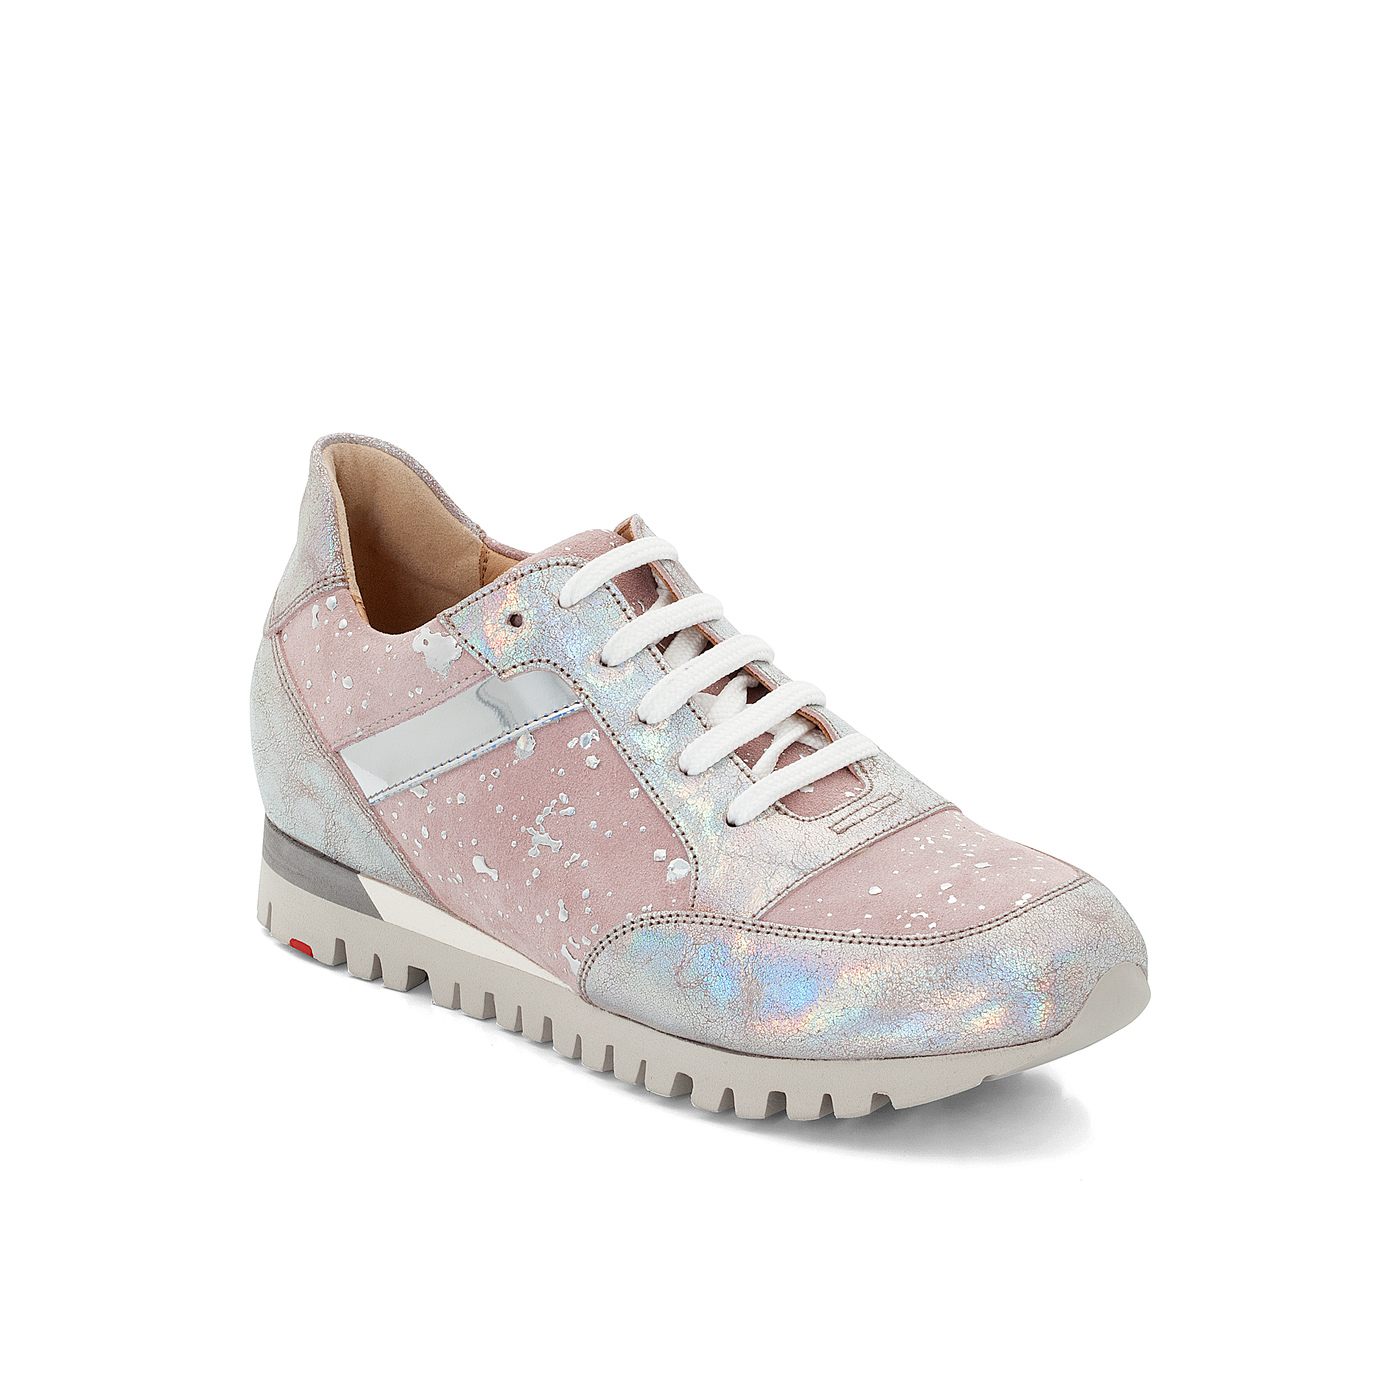 Sneaker | Sneakers, Shoes, Fashion